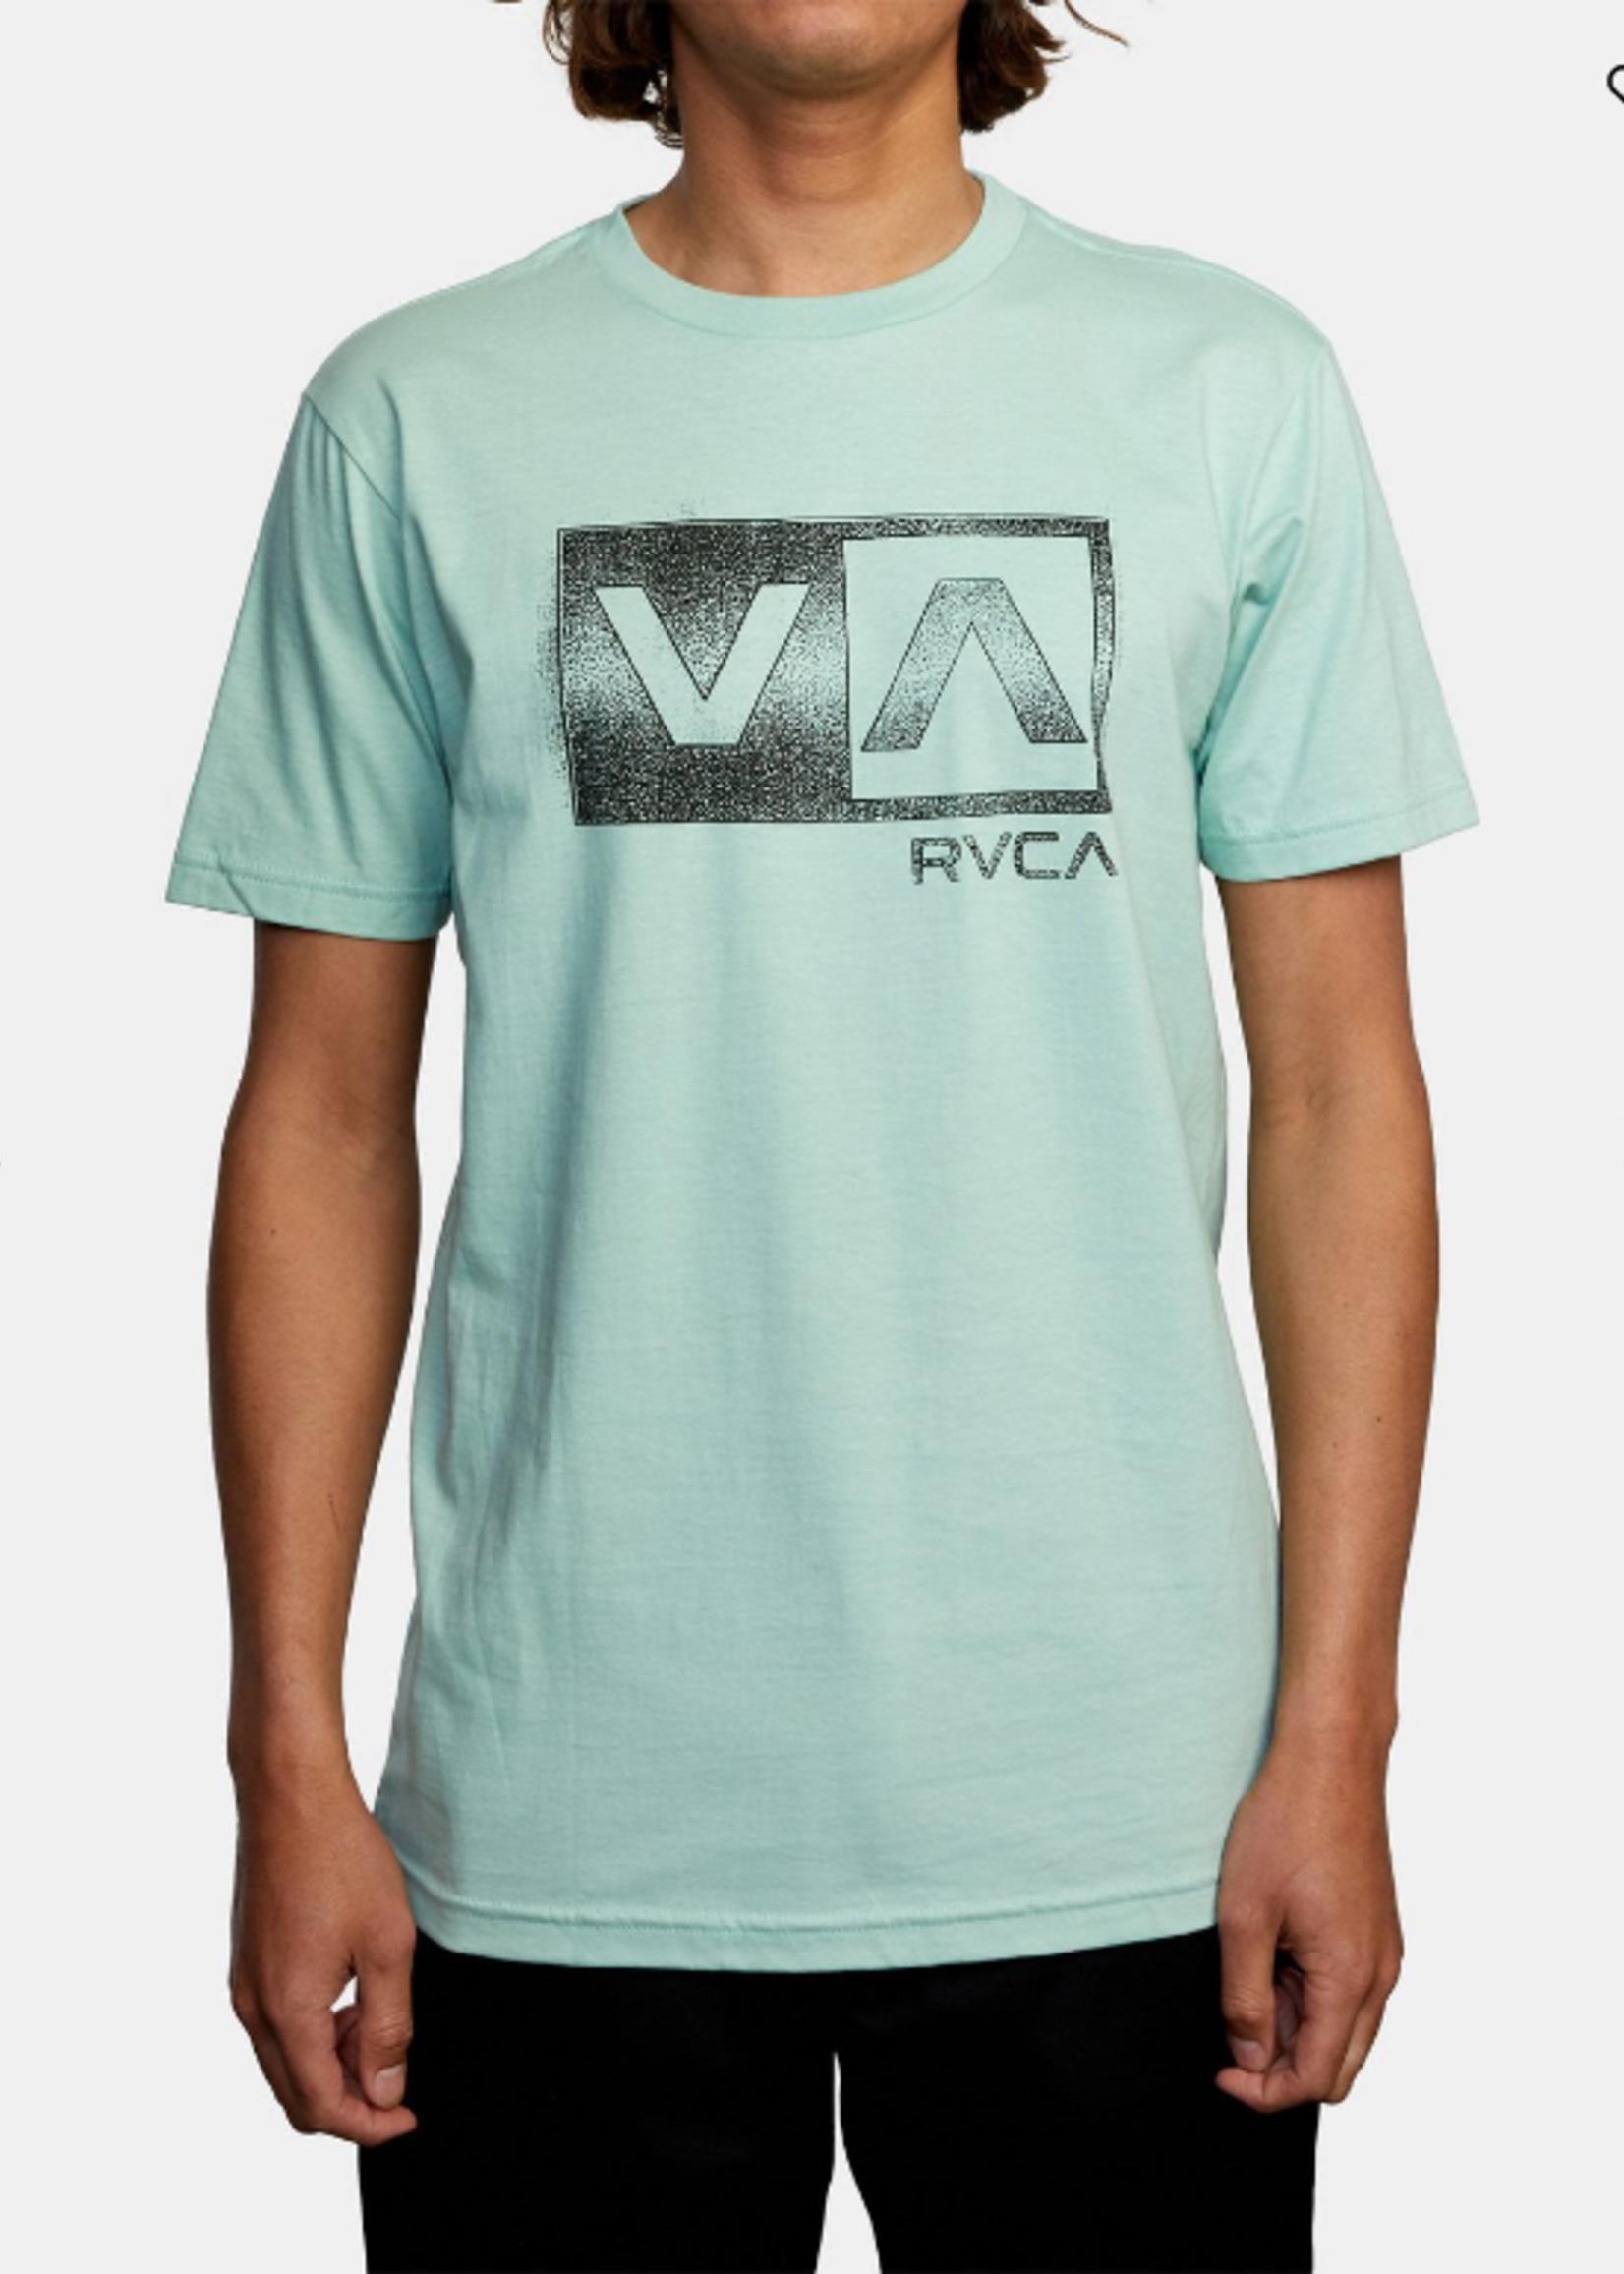 RVCA Balance Box Short Sleeve - Mint